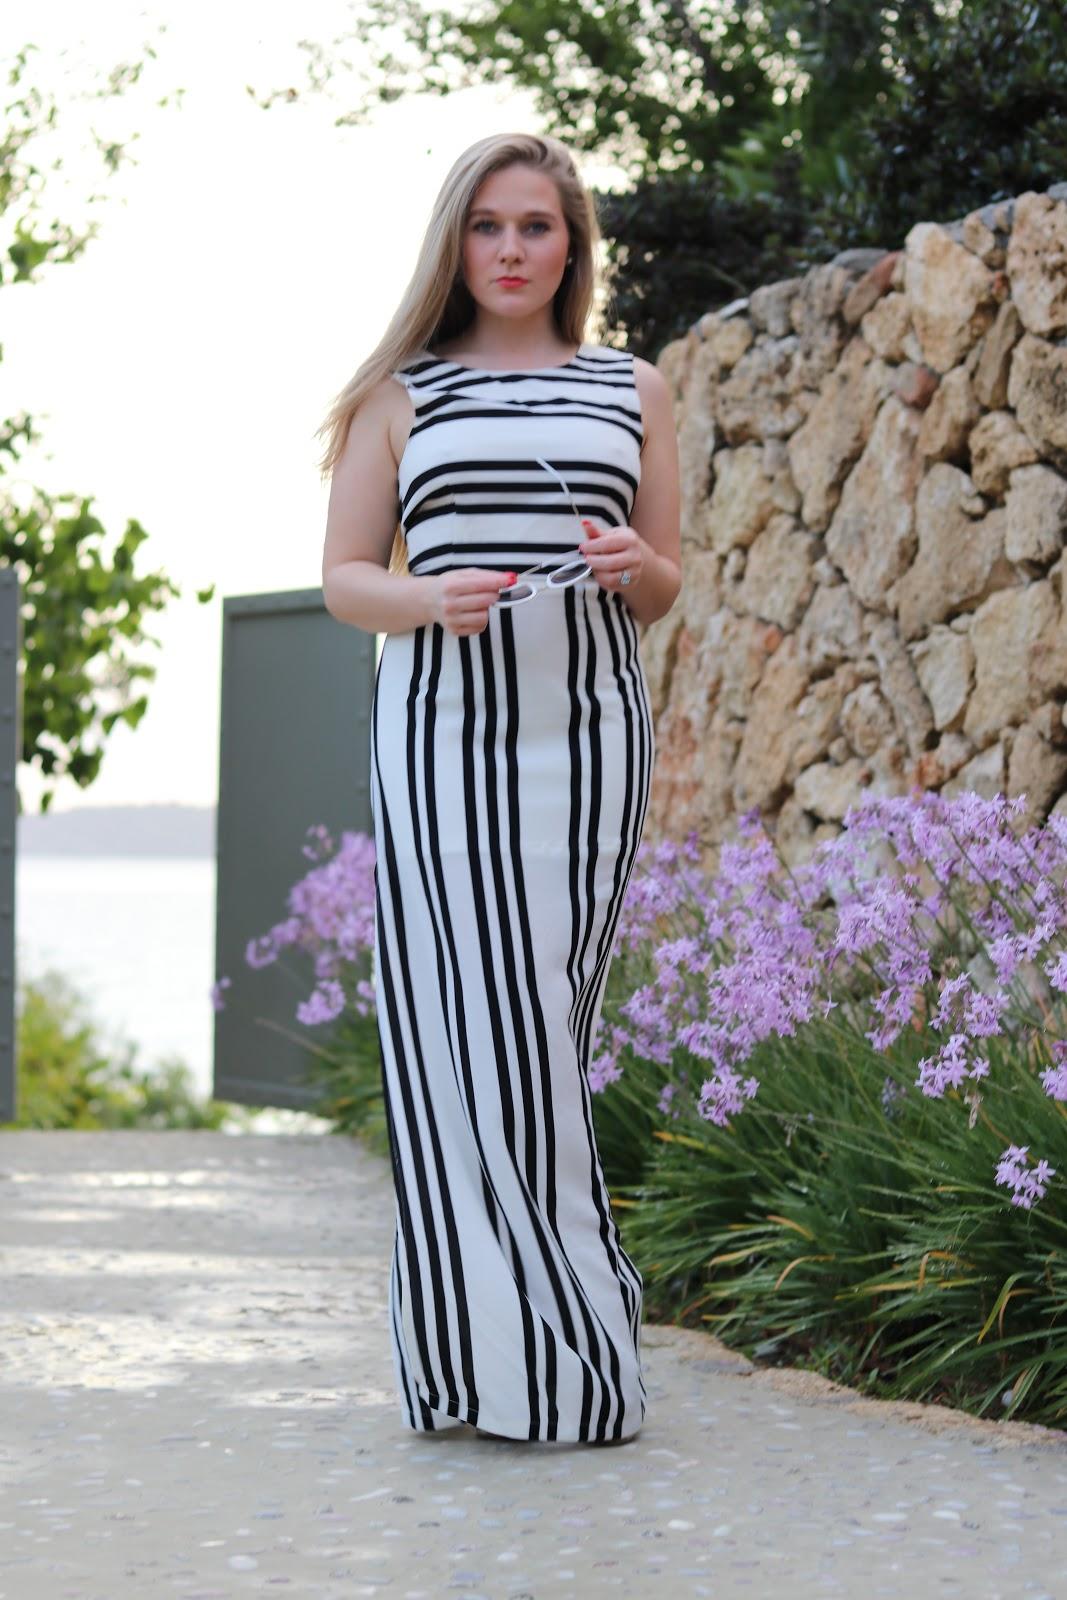 Blonde girl in stripe maxi dress from ASOS at F Zeen Resort, Kefalonia